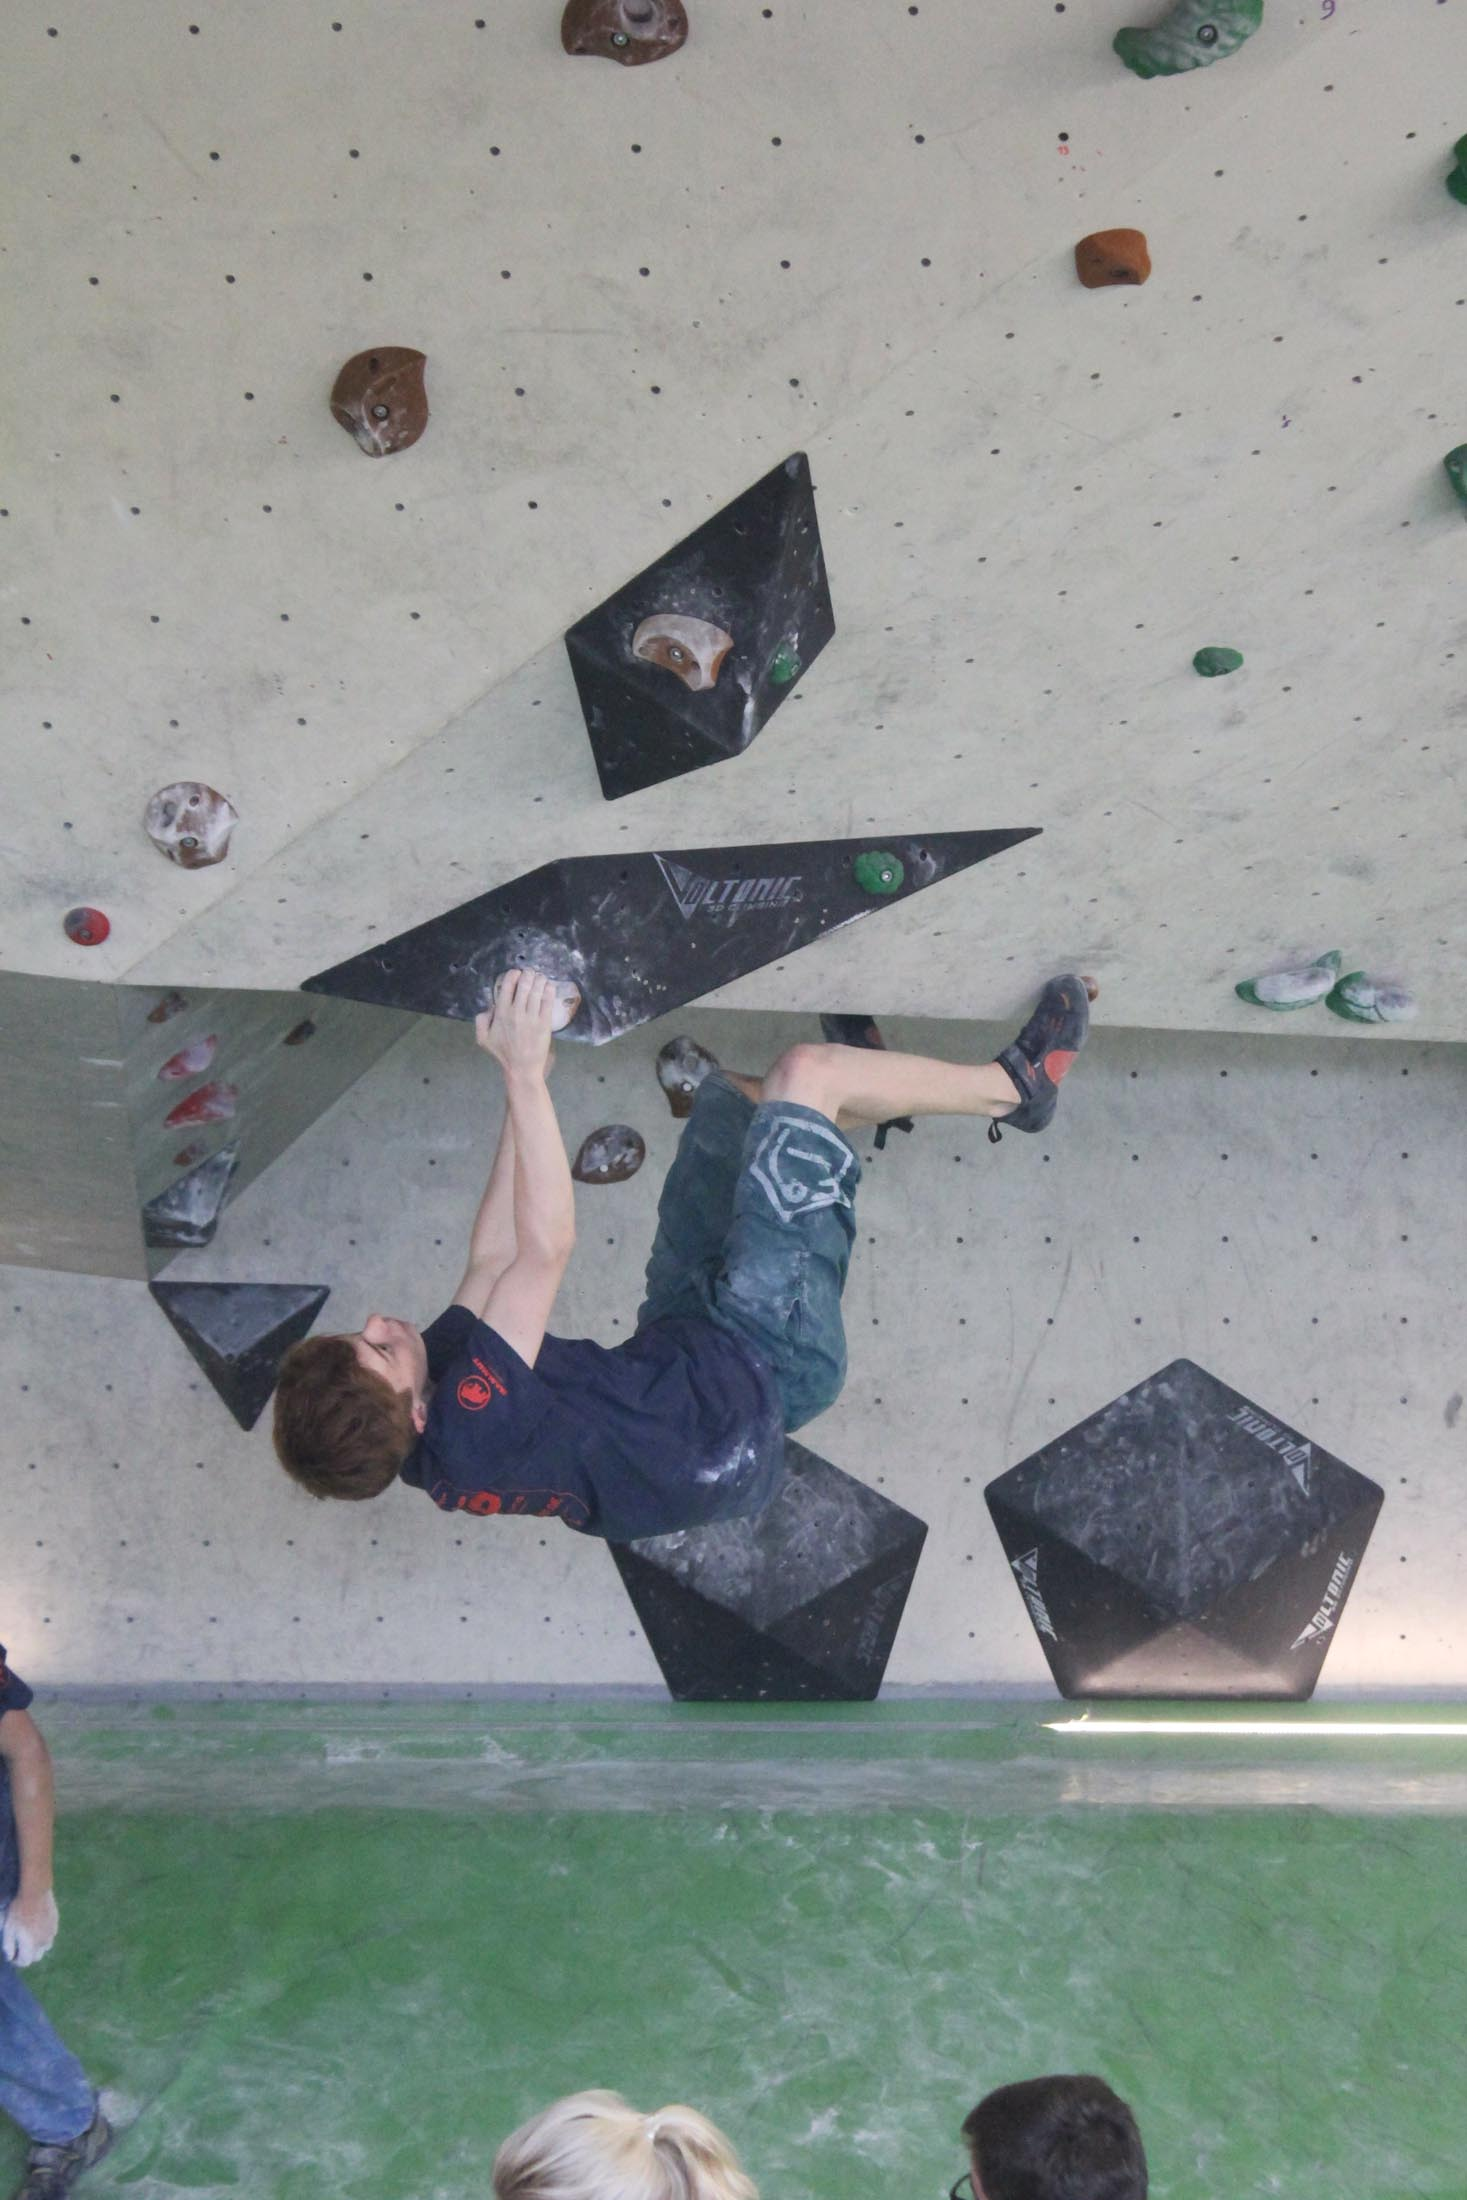 Quali, internationaler bouldercup Frankenjura 2016, BLOCKHELDEN Erlangen, Mammut, Bergfreunde.de, Boulderwettkampf07092016306